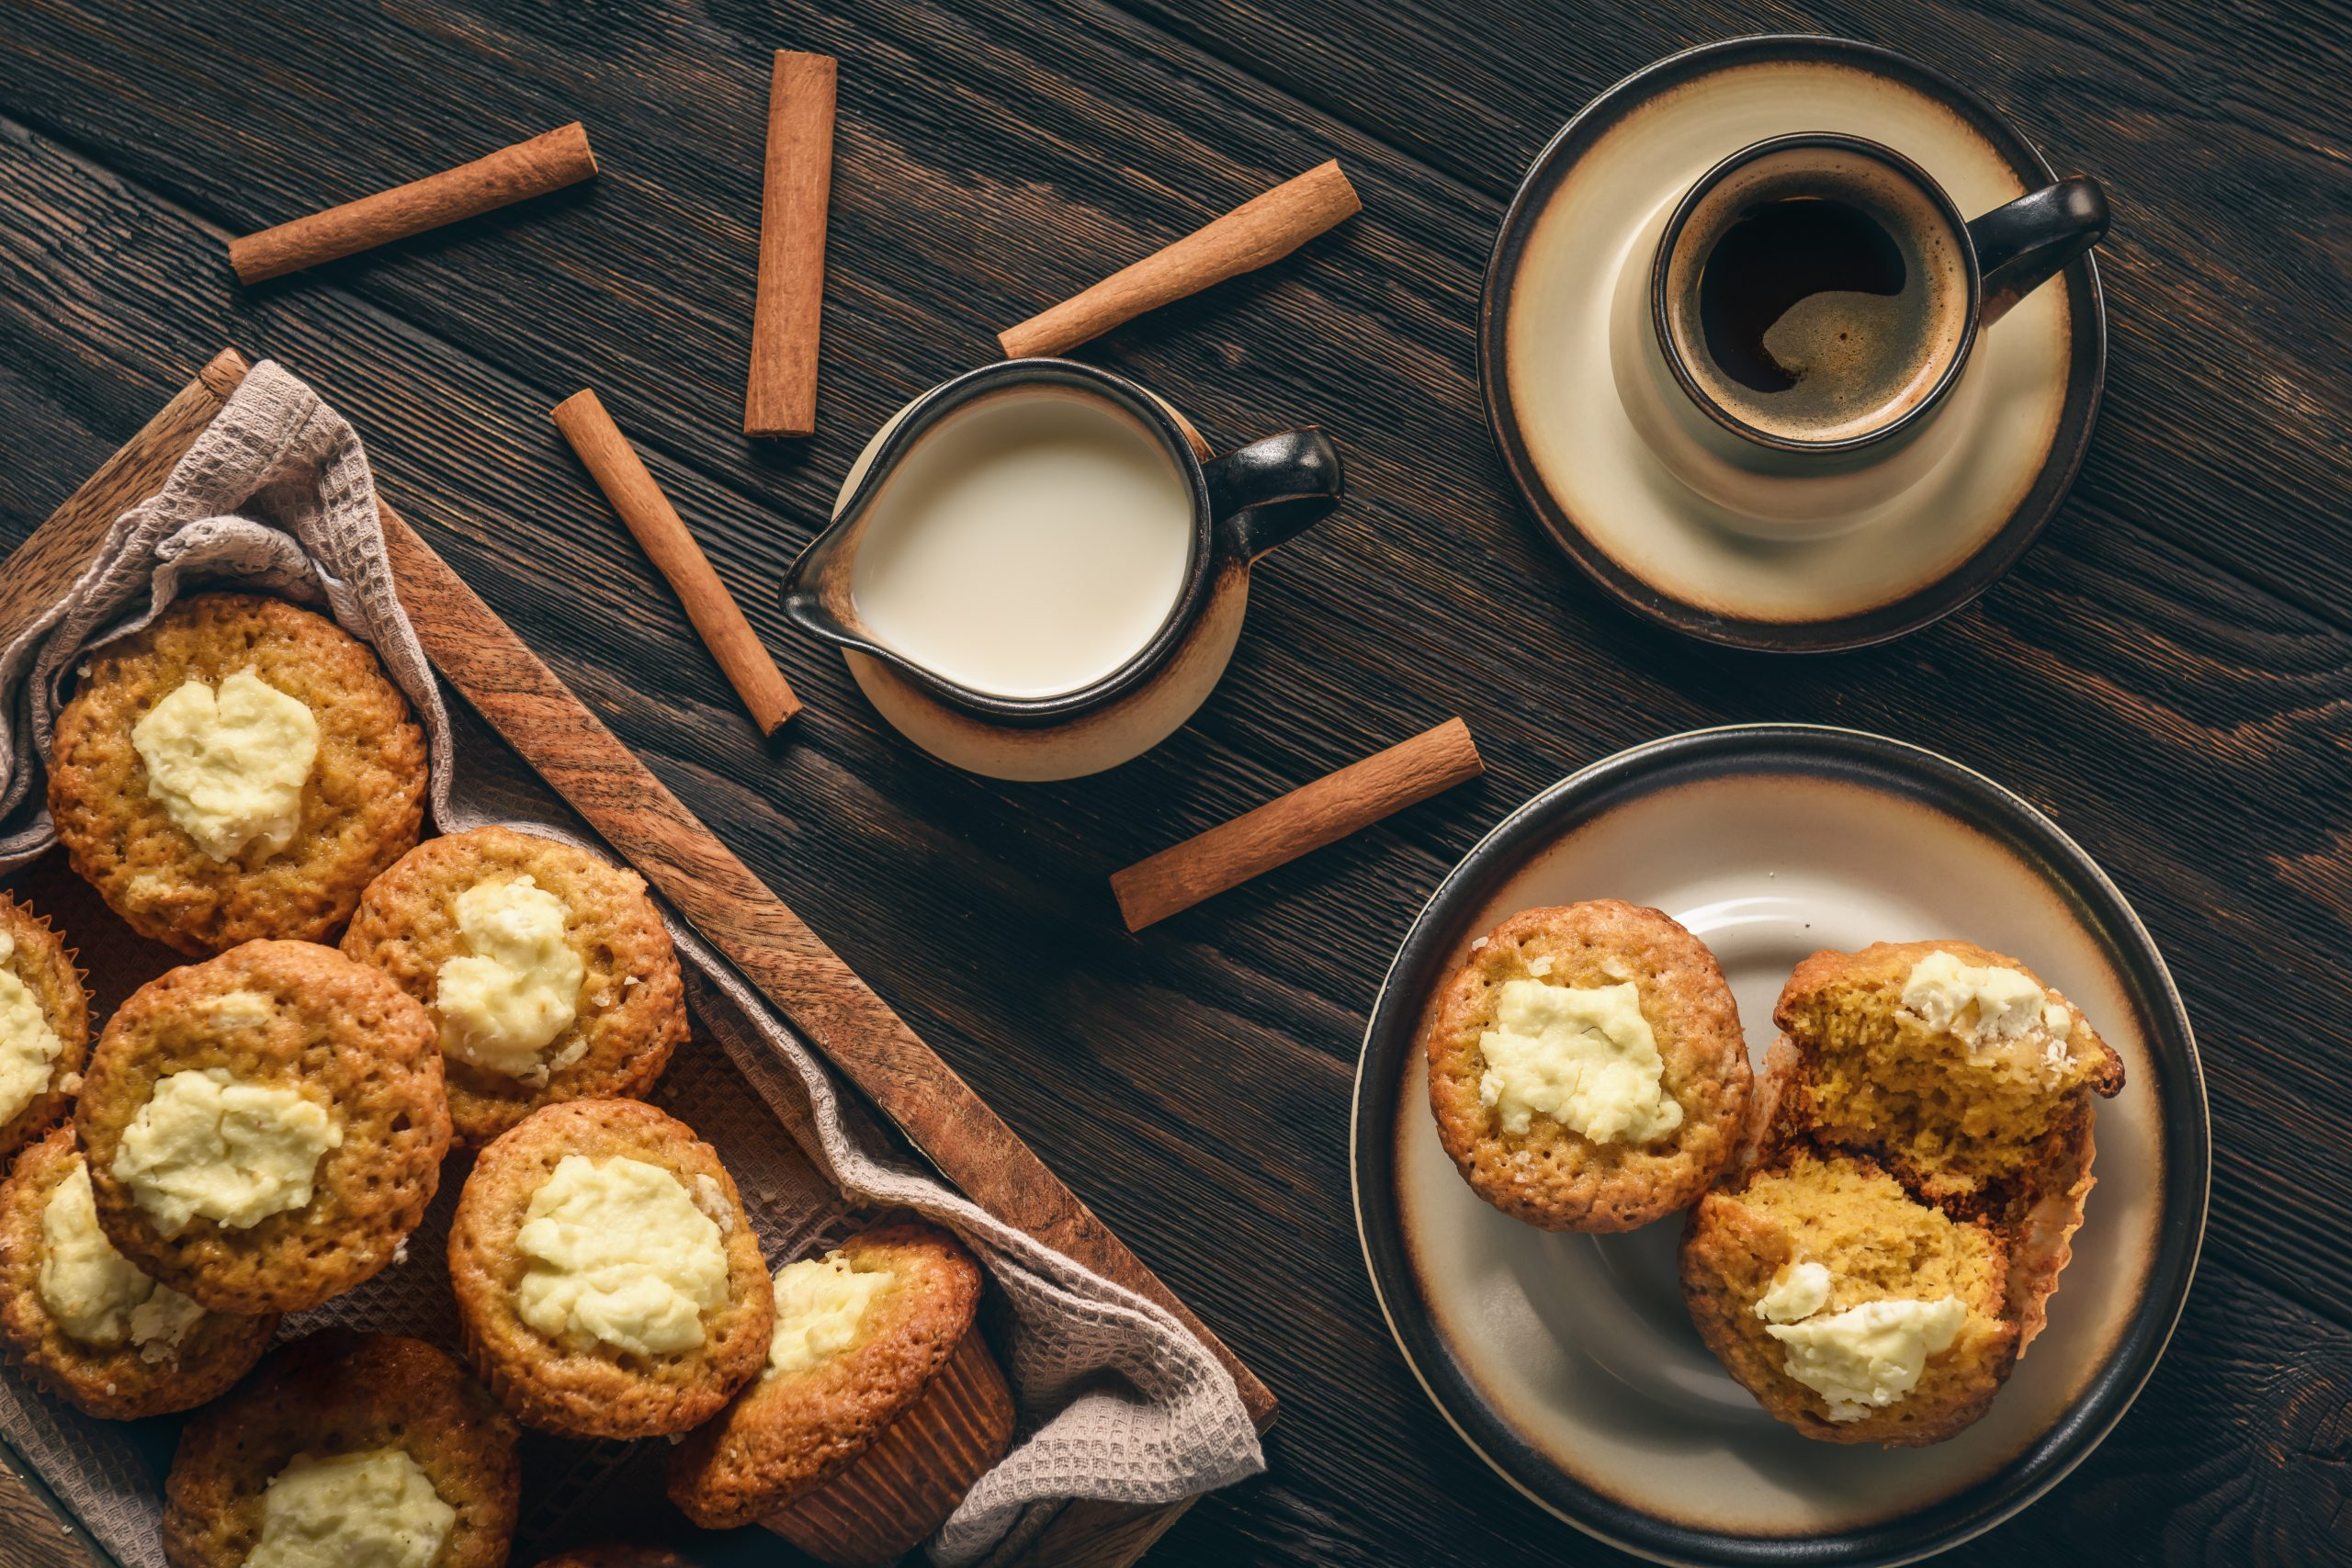 Keto Cream Cheese Pumpkin Muffins